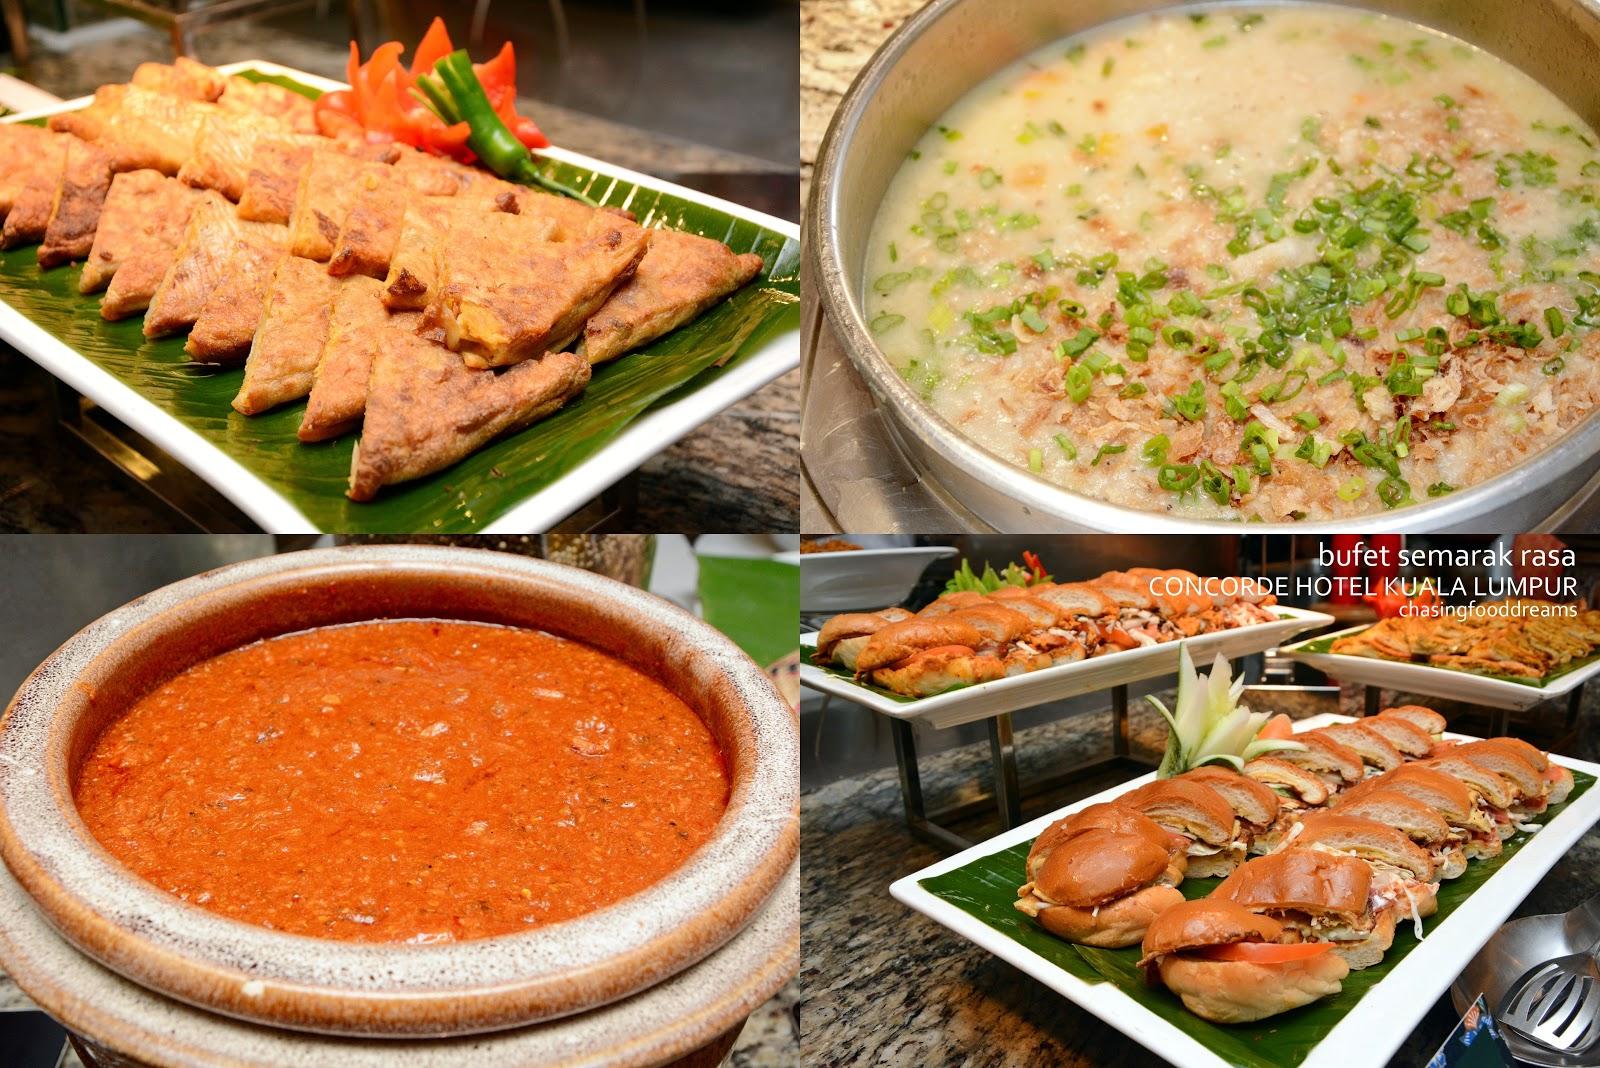 CHASING FOOD DREAMS: Melting Pot Café Buka Puasa Buffet